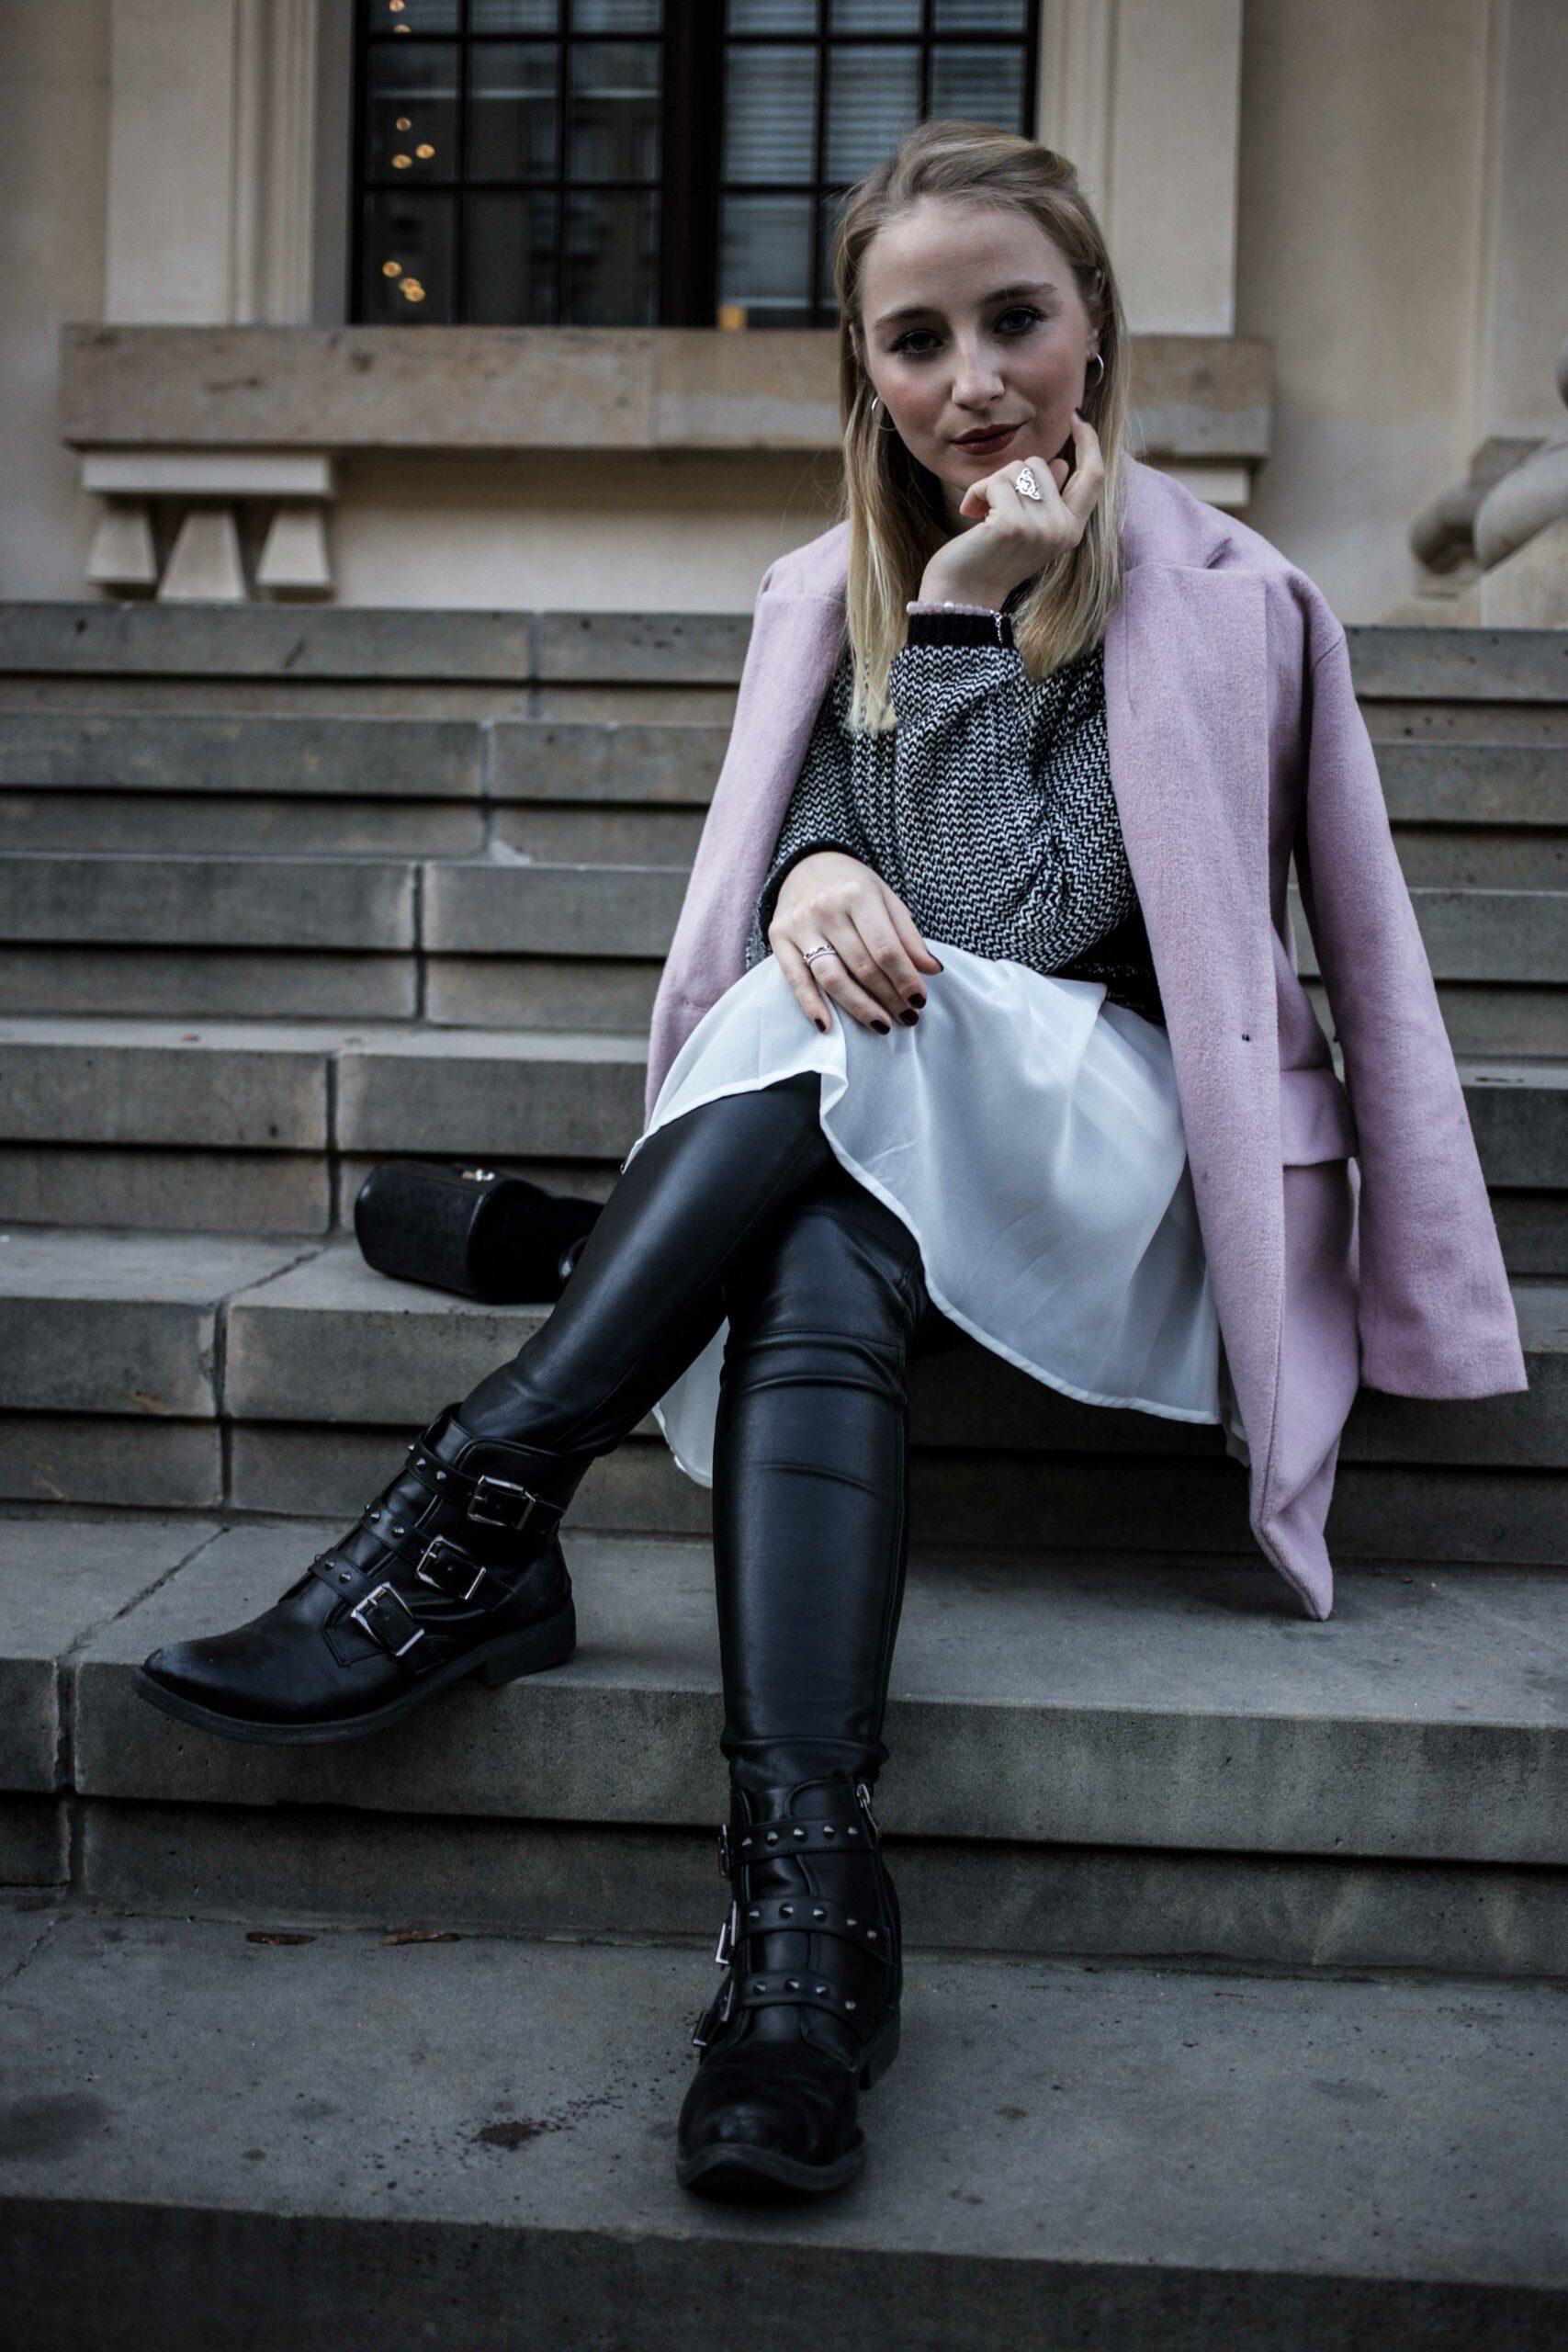 layering-outfit-biker-lederhose-thomas-sabo-schmuck-winter-outfit-berlin-fashionblog-modeblog_7550